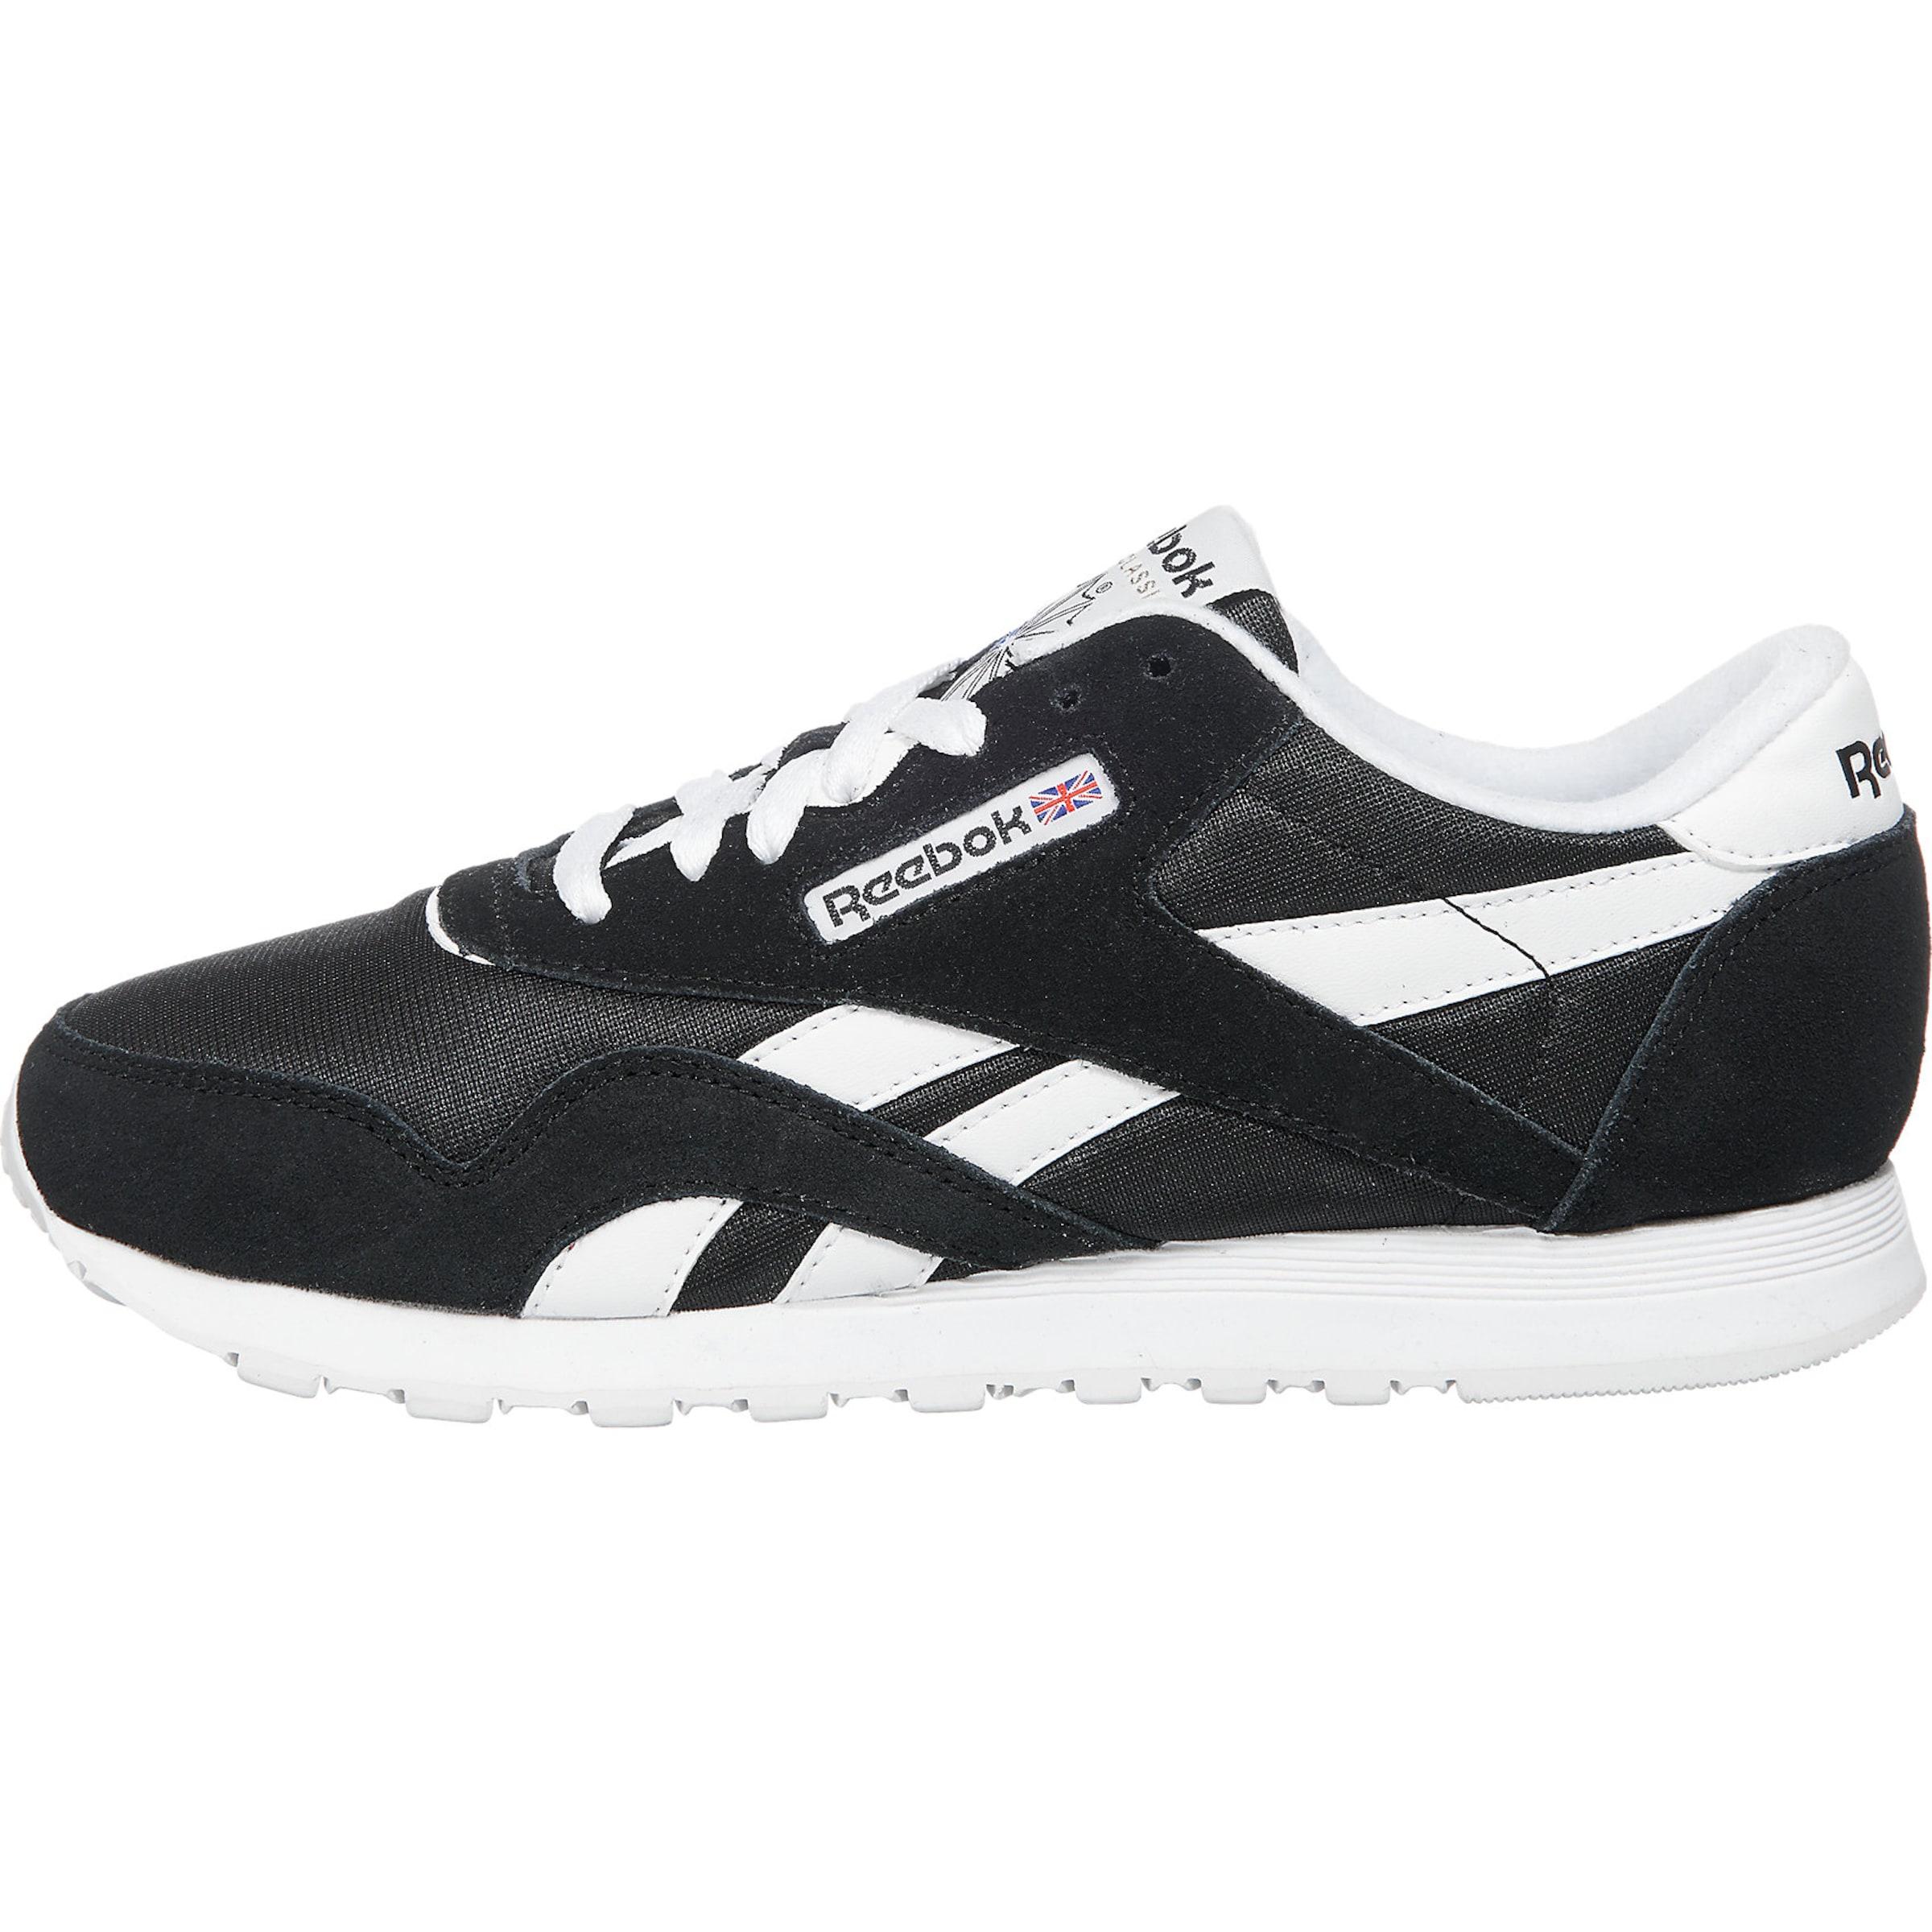 Sneaker classic Reebok Sneaker 'Nylon' classic classic Sneaker classic Reebok 'Nylon' Reebok 'Nylon' Reebok vPqxnCxAwa